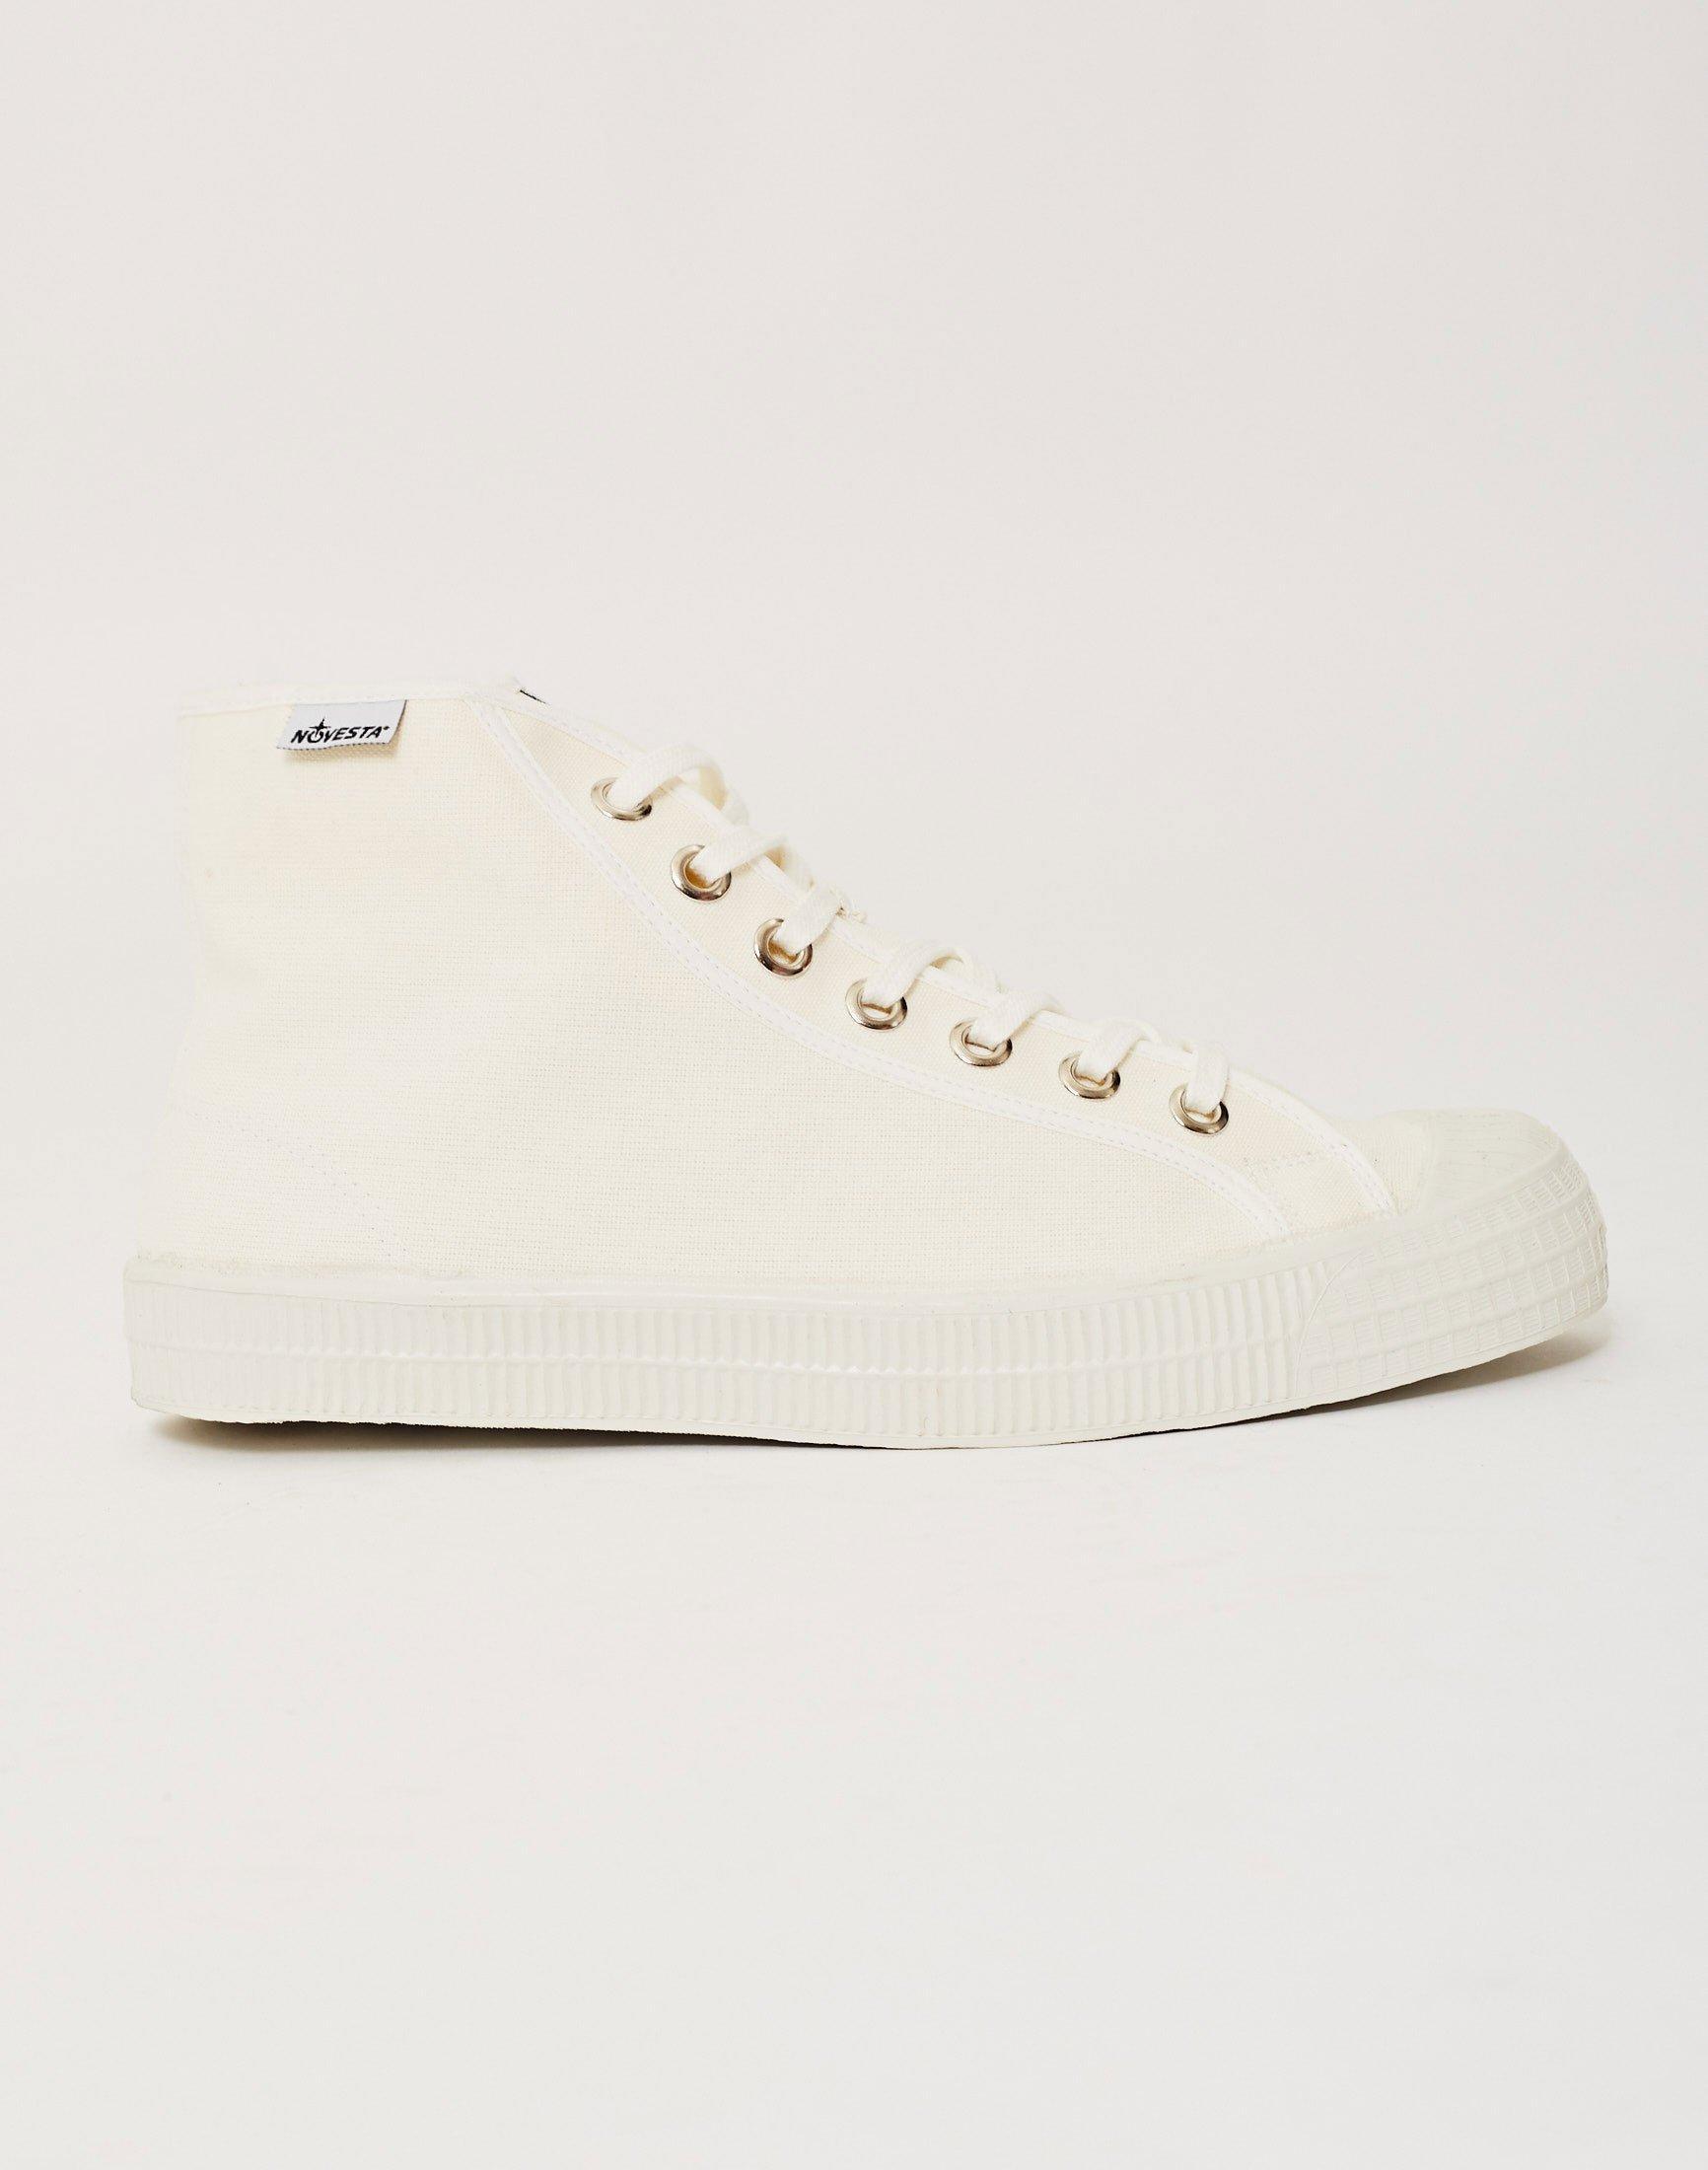 38cfd916ddf1 Novesta Star Dribble Hiplimsoll Off White in White for Men - Save 20% - Lyst